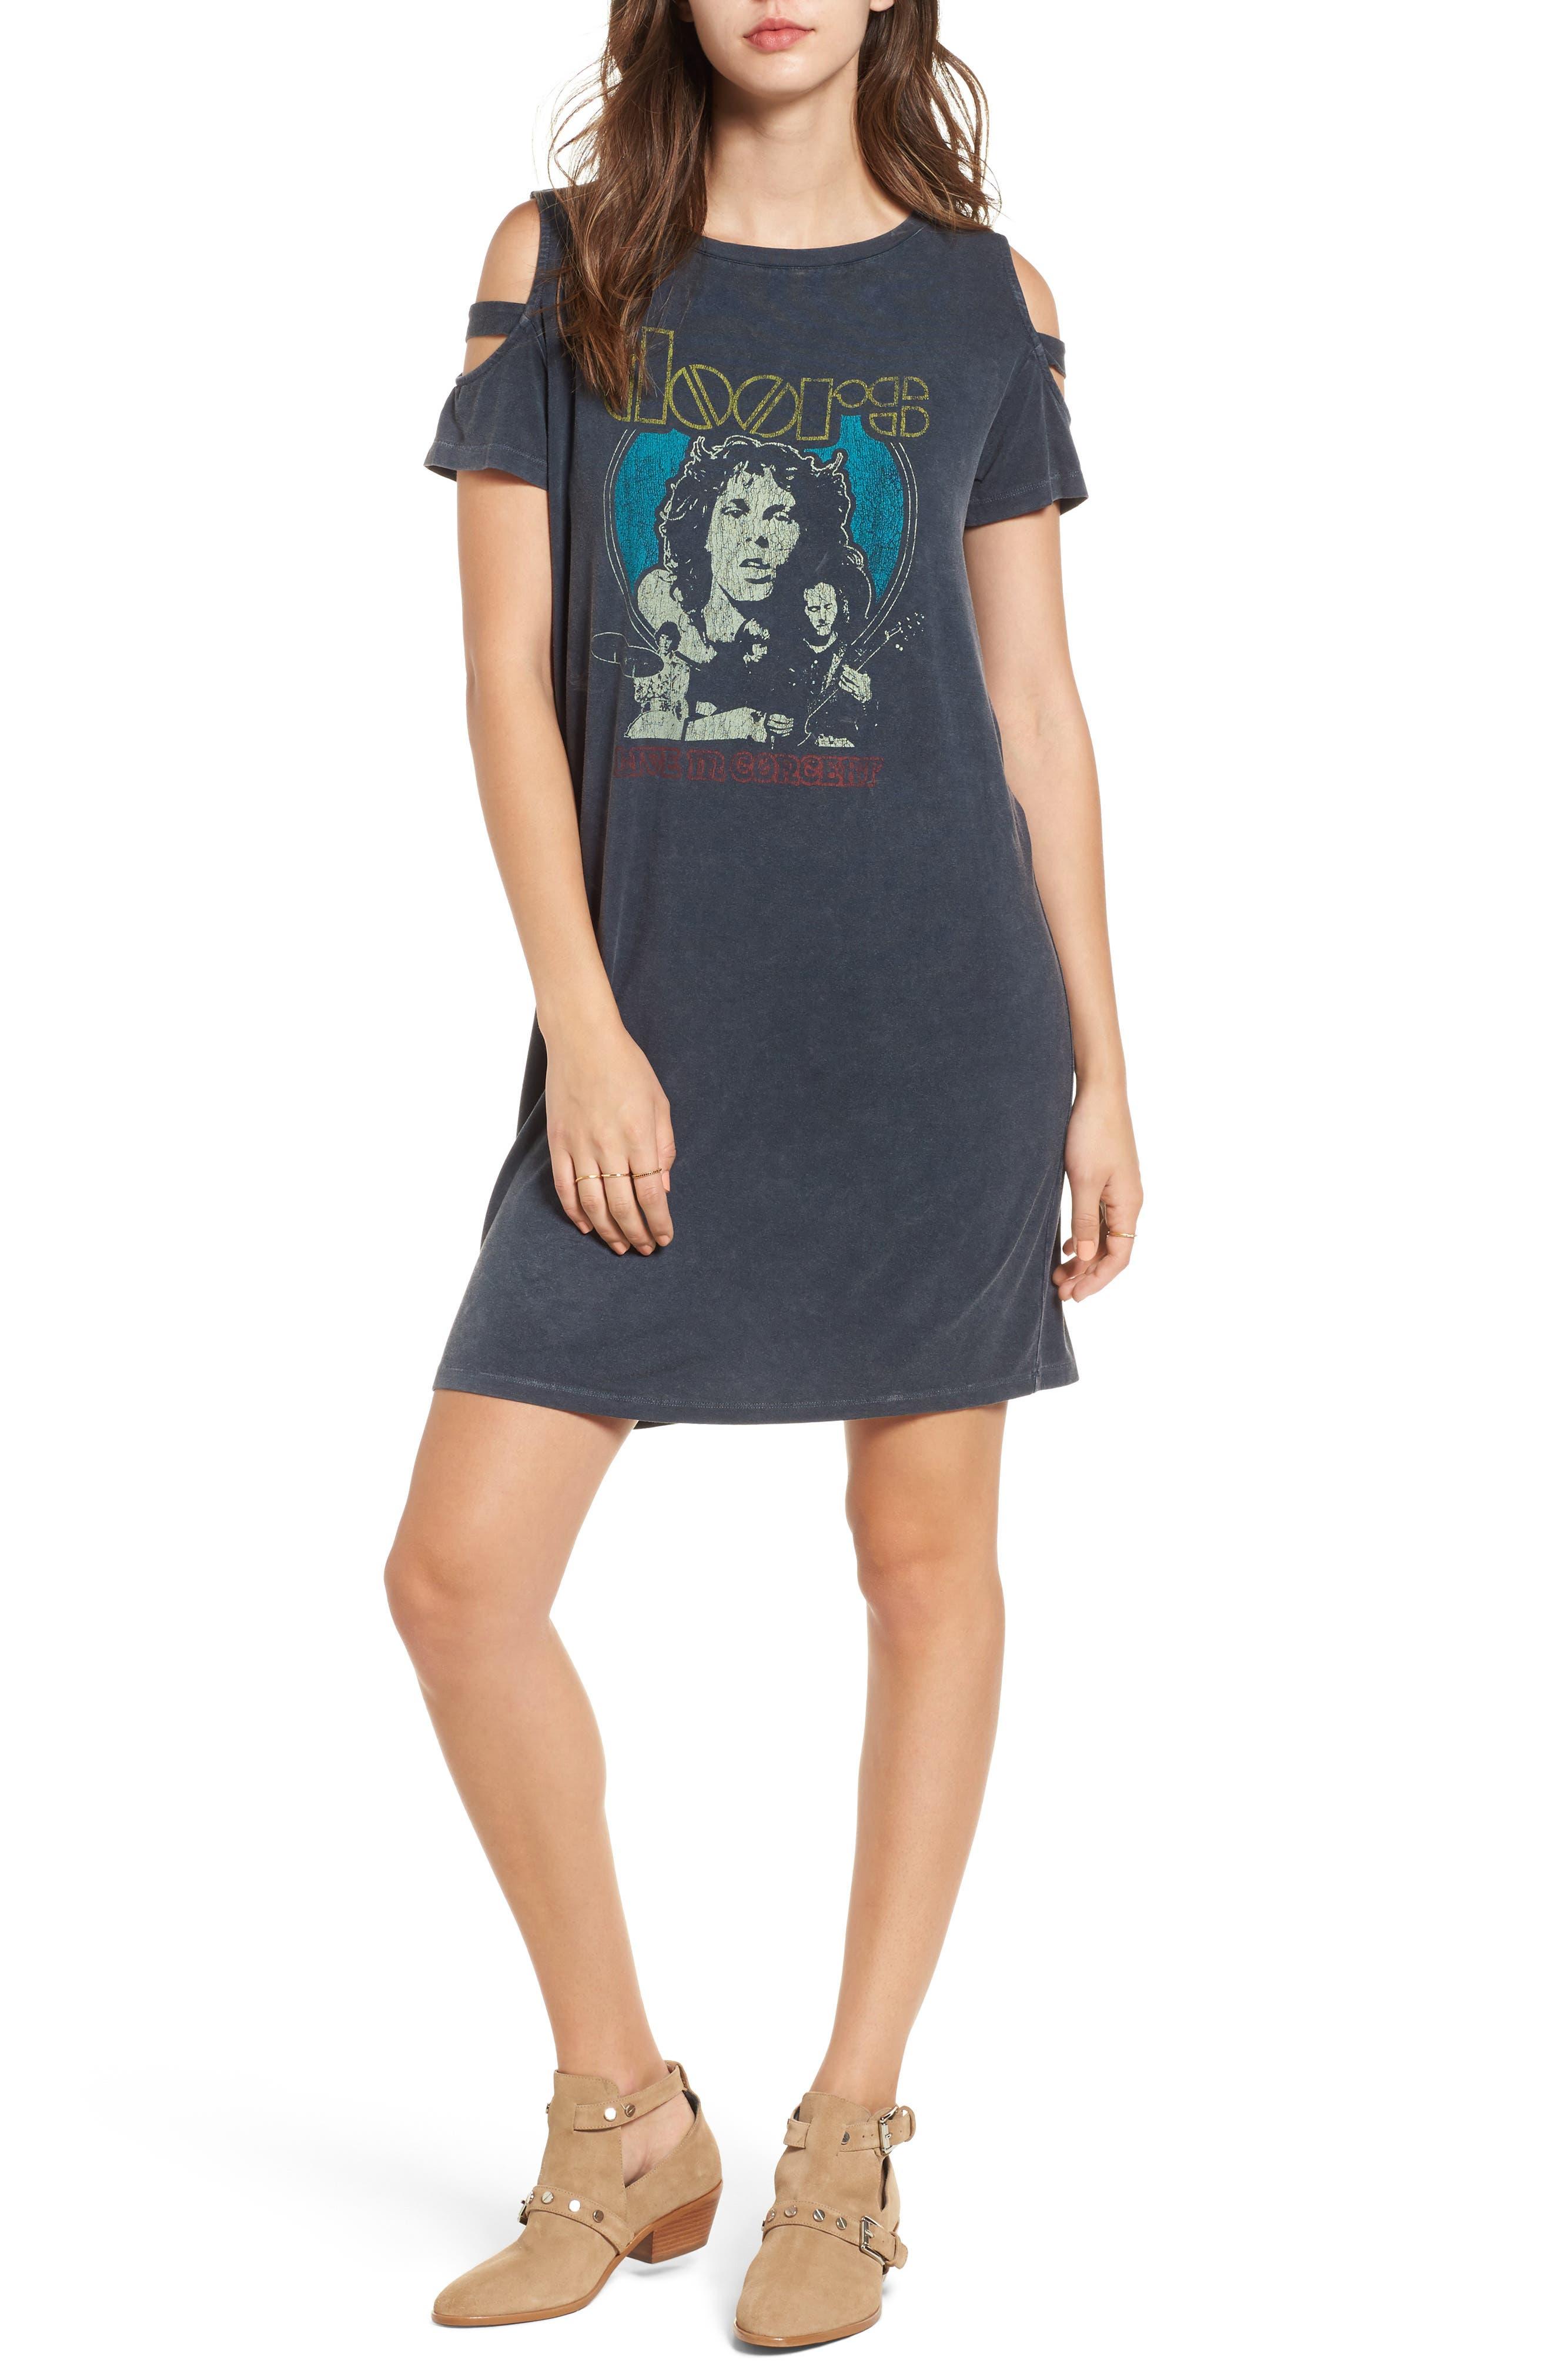 Doors Distressed Band T-Shirt Dress,                             Main thumbnail 1, color,                             Charcoal